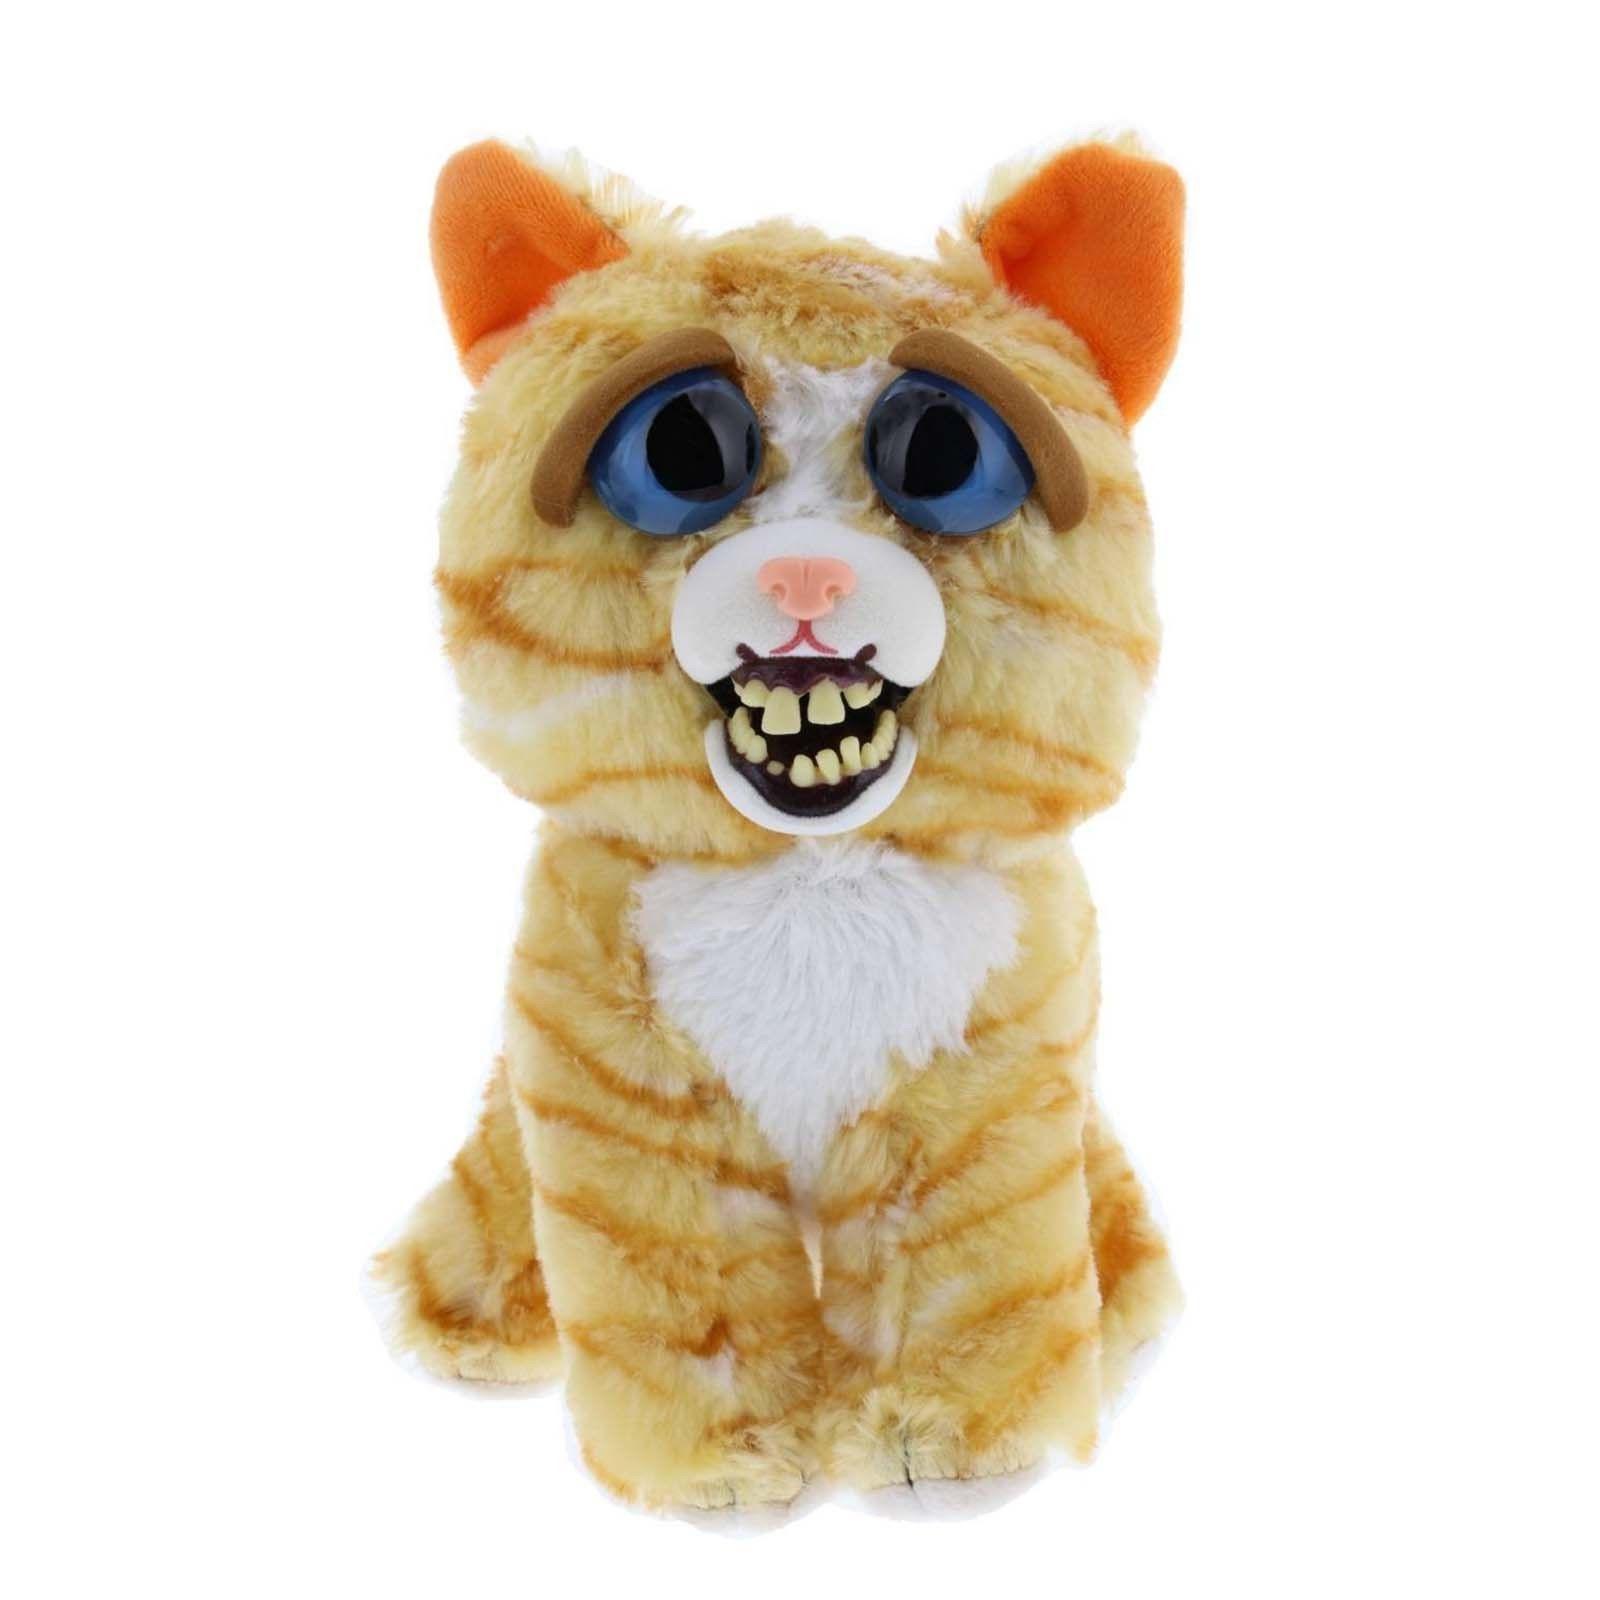 Feisty Princess Orange 8 Inch Plush Figure Toys